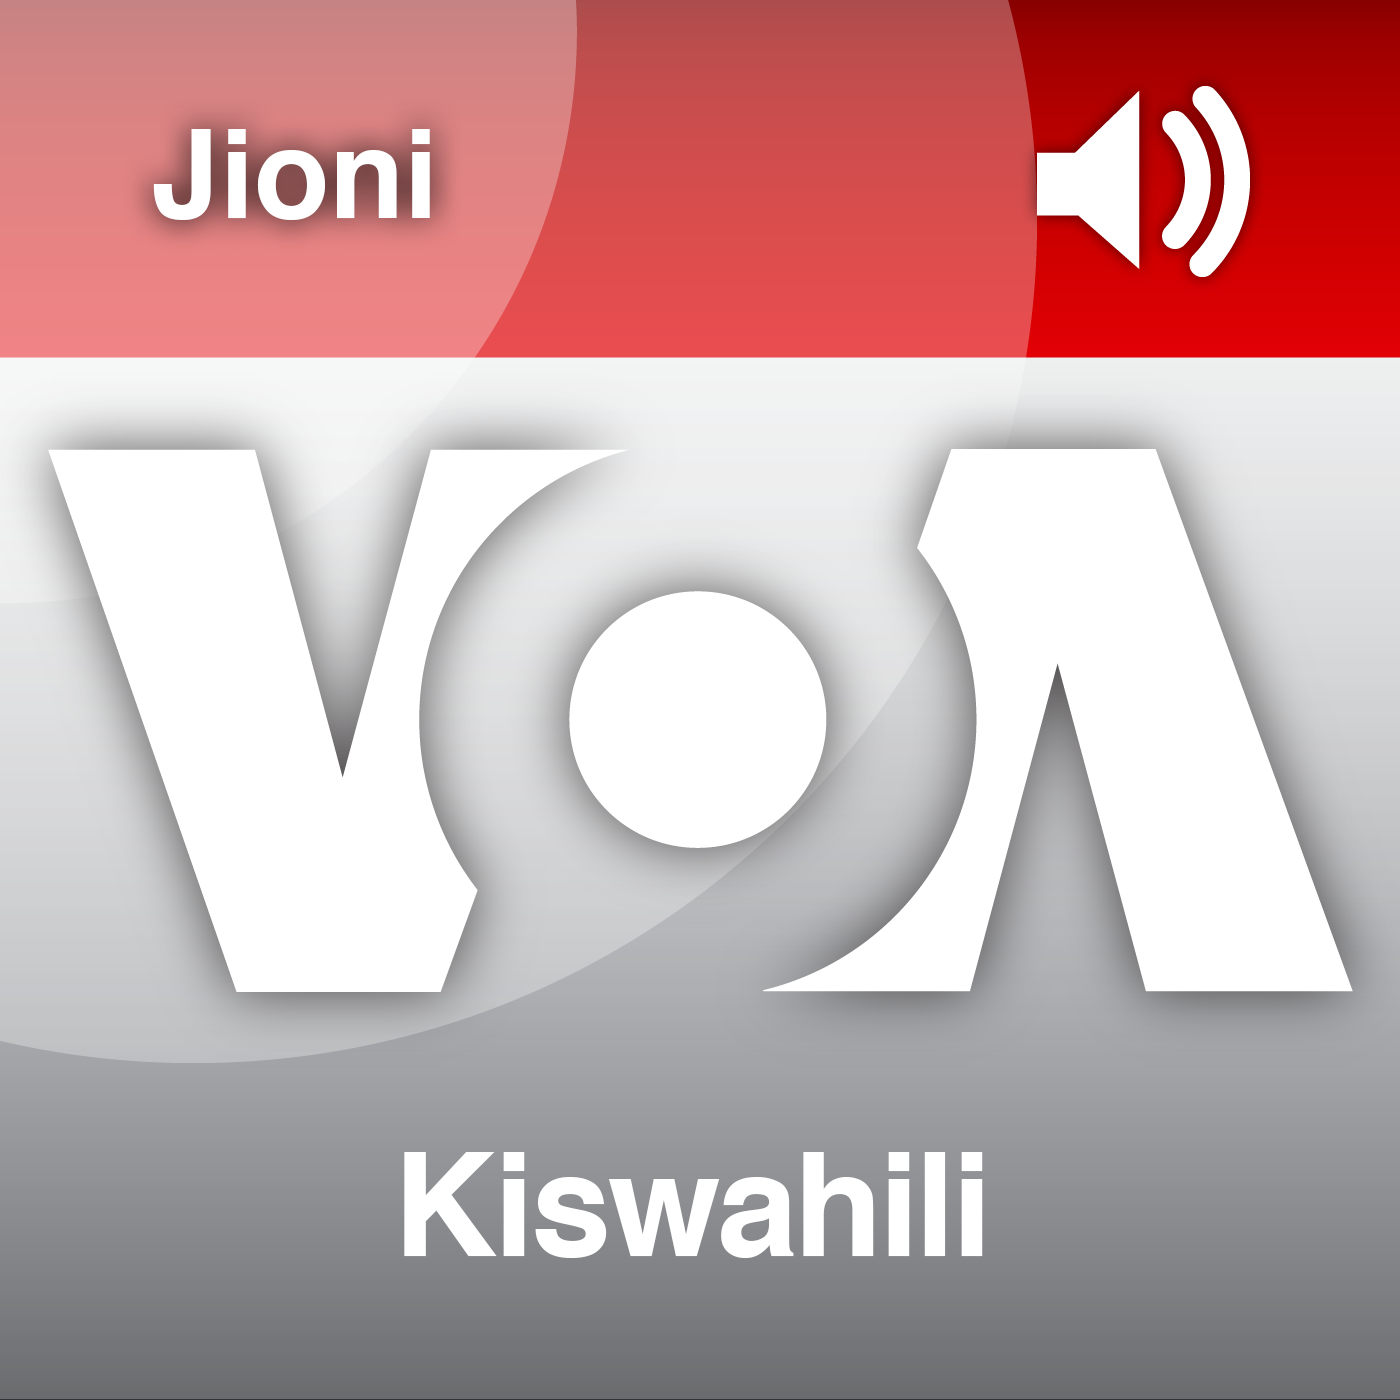 Jioni - Voice of America